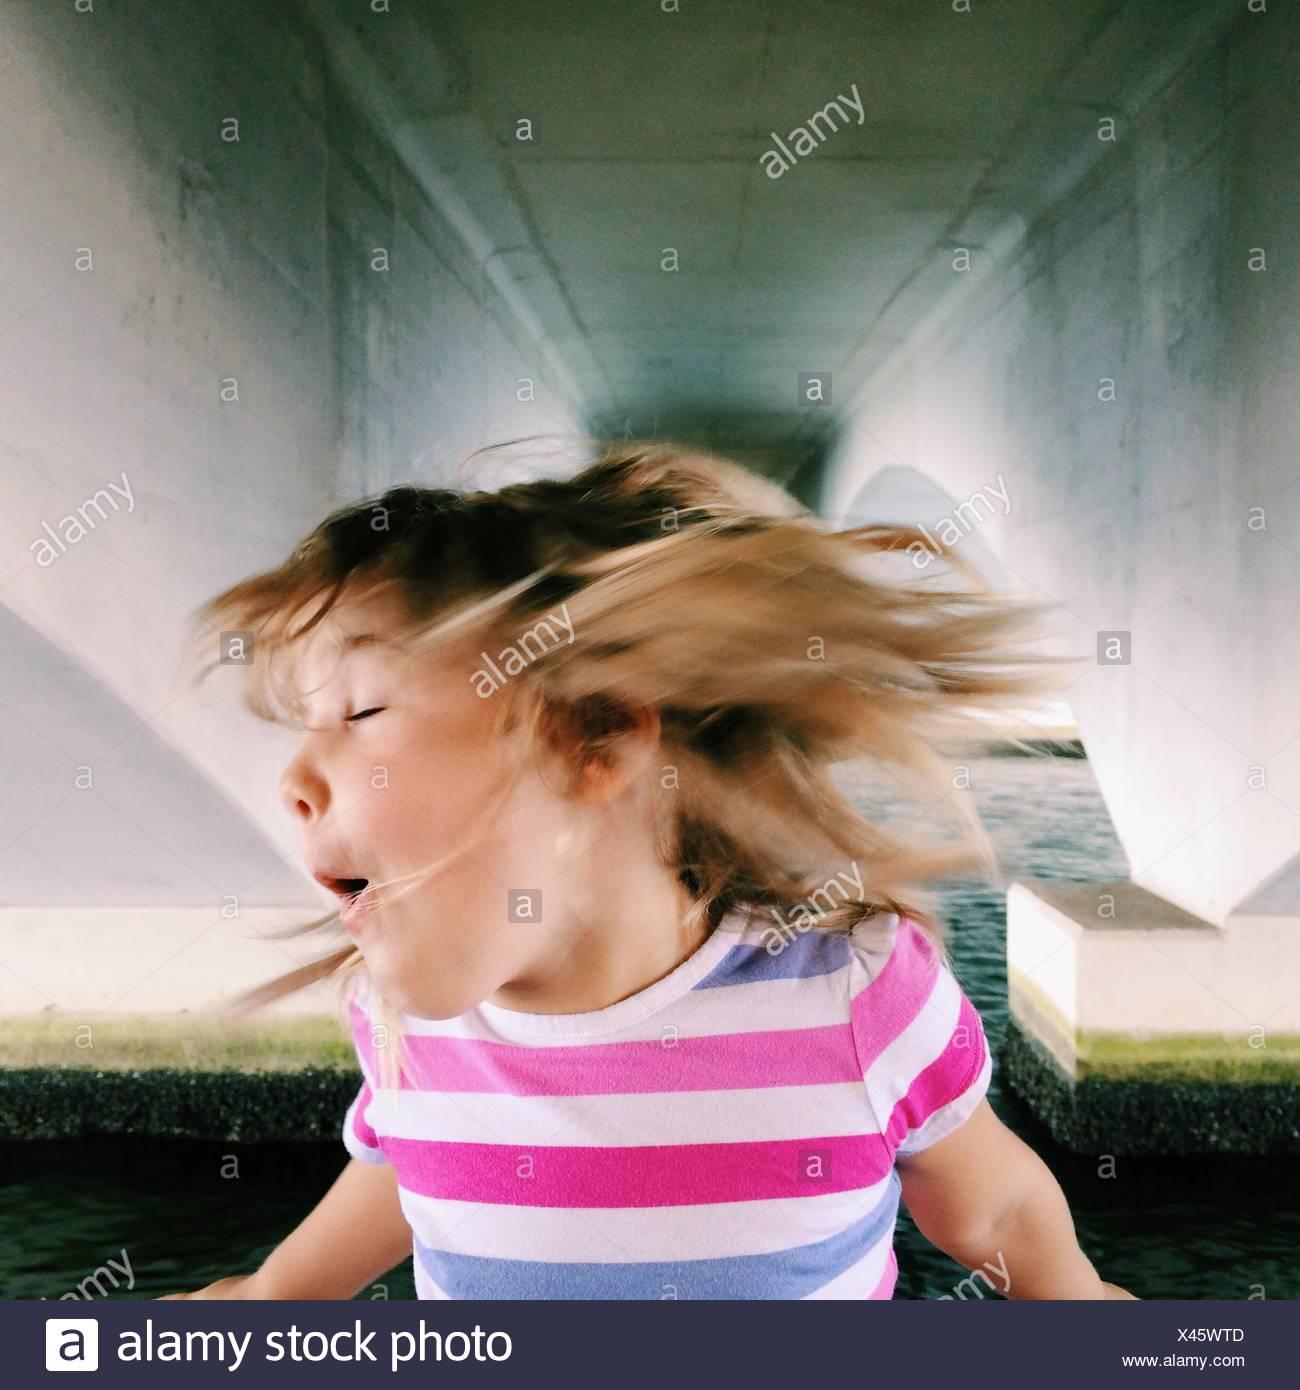 USA, Florida, Palm Beach County, West Palm Beach, Girl (2-3) shaking head - Stock Image